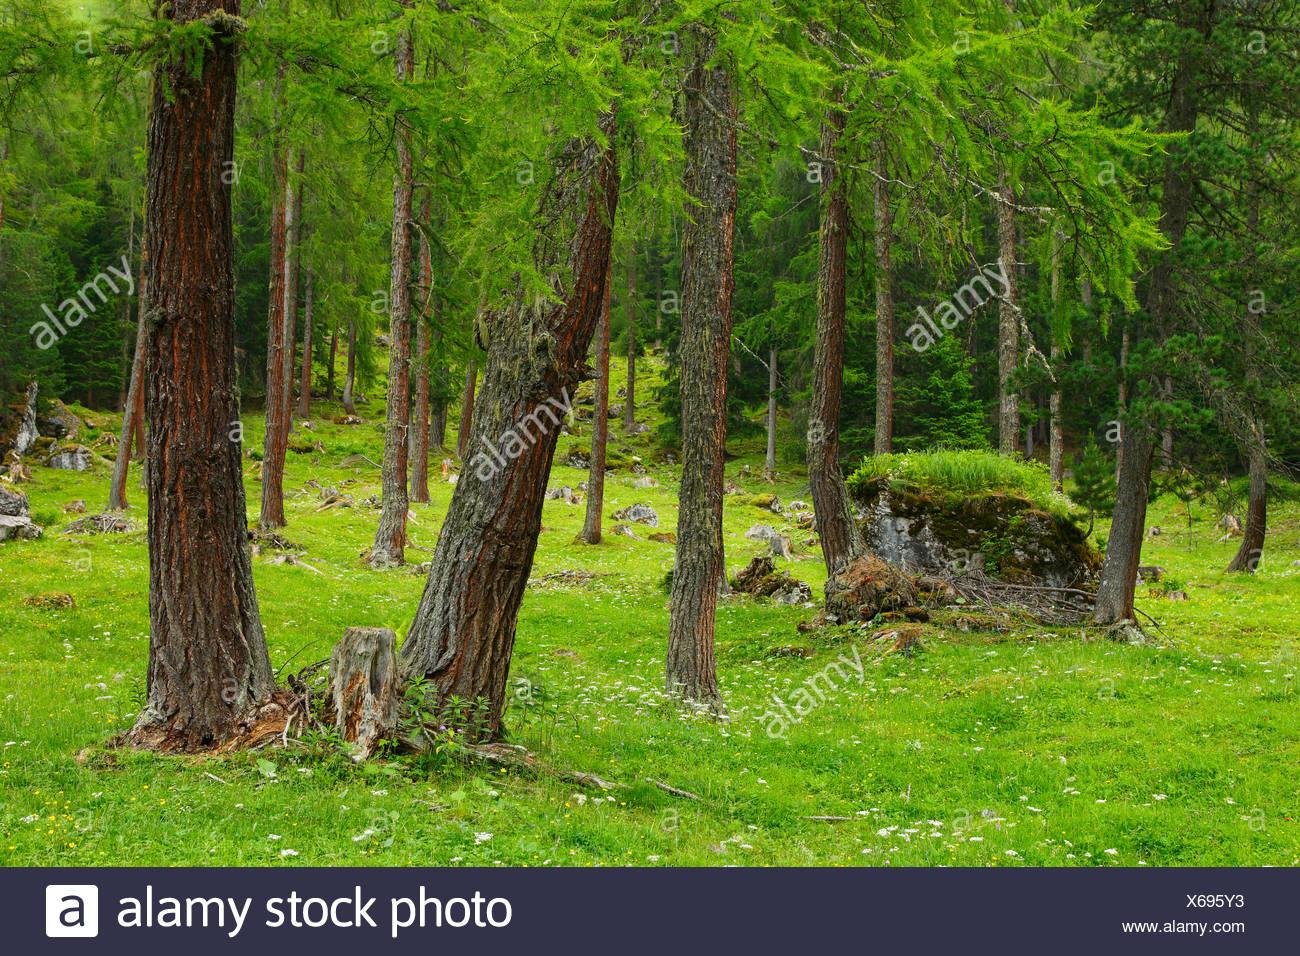 Coniferous forest in summer, Switzerland - Stock Image